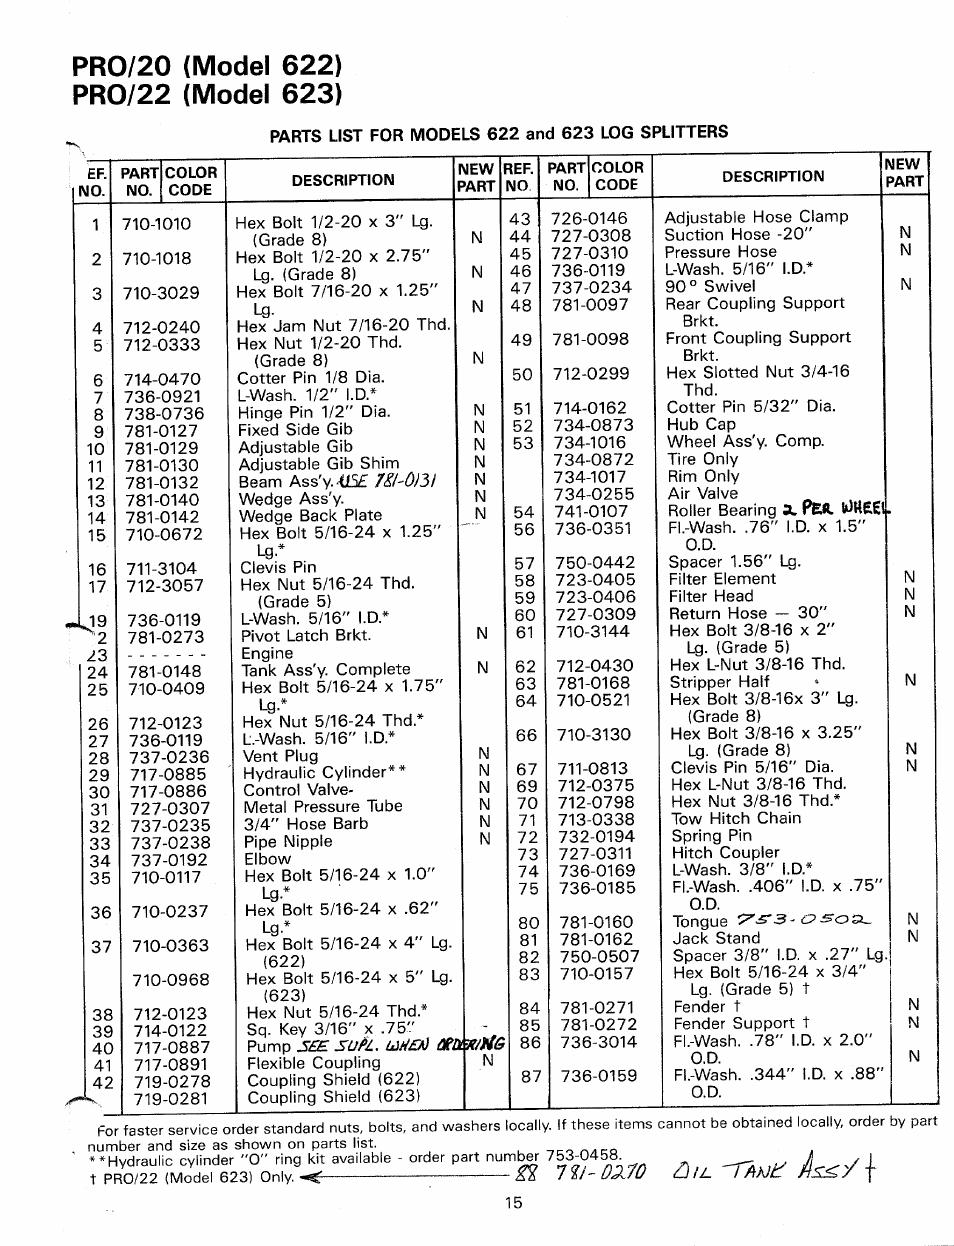 Pro/20 (model 622) pro/22 (model 623) | MTD Duerr 248-623-003 User Manual |  Page 15 / 16